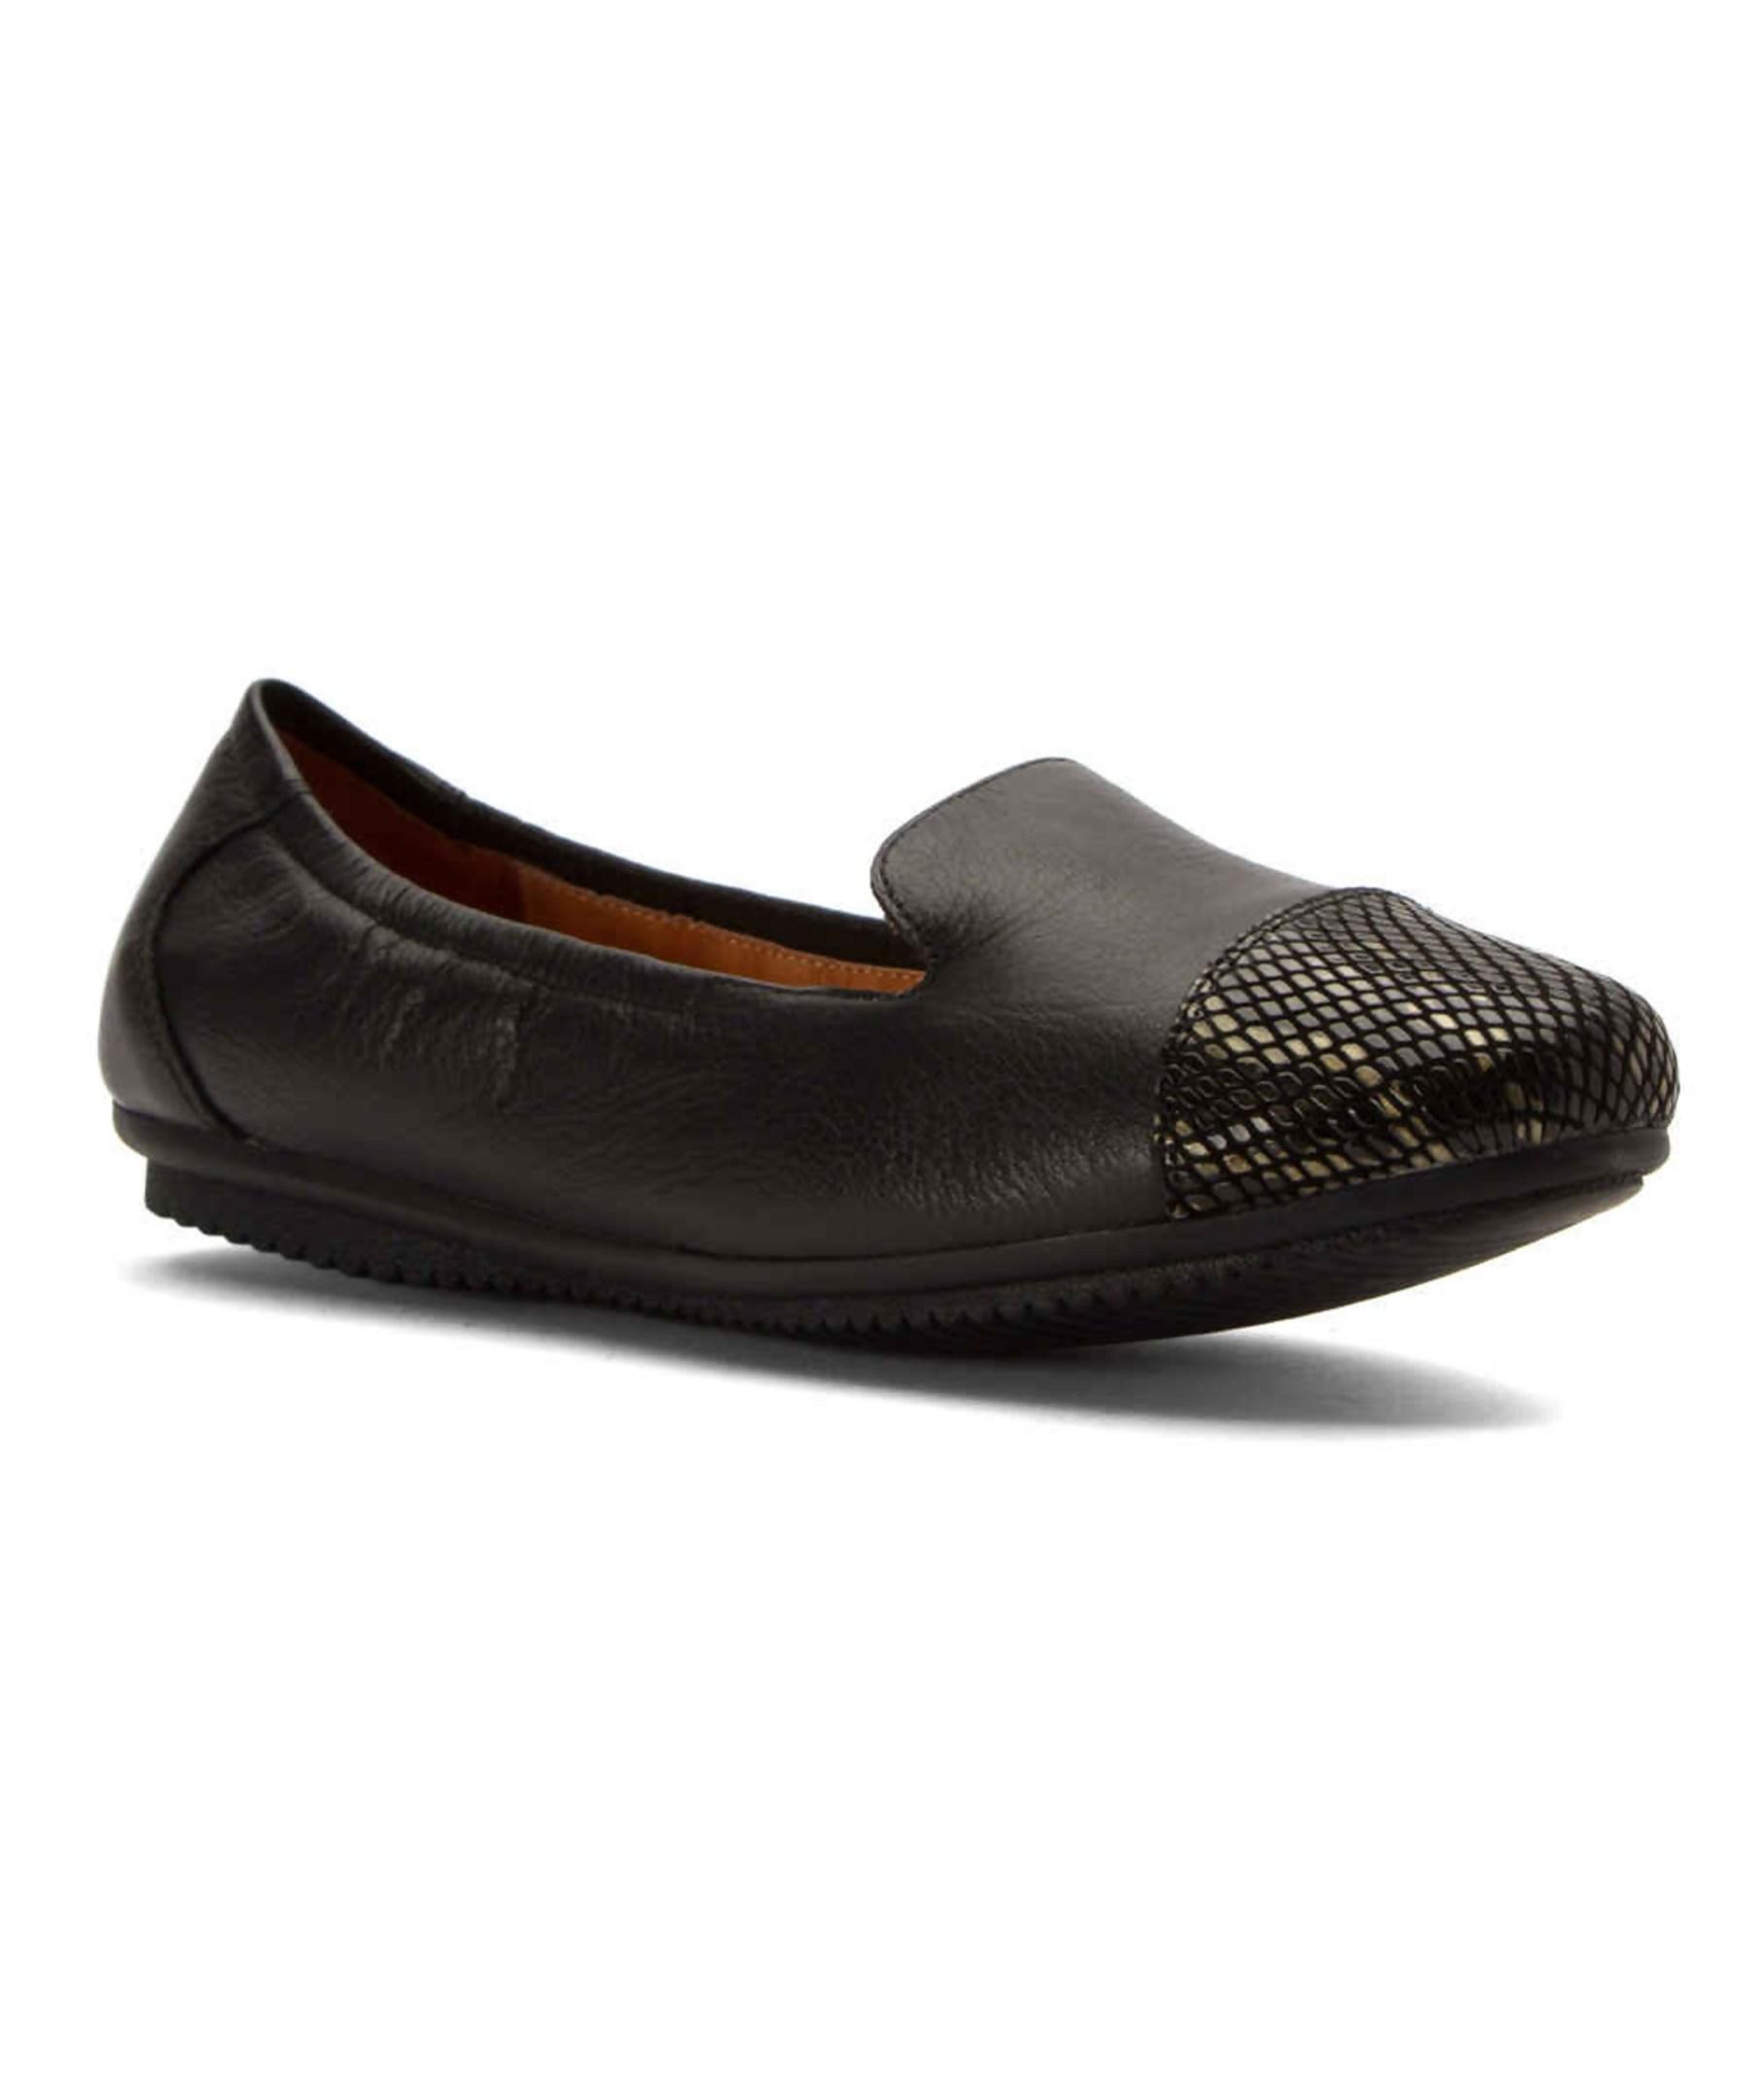 josef seibel women 39 s pippa 23 flats shoes in black lyst. Black Bedroom Furniture Sets. Home Design Ideas